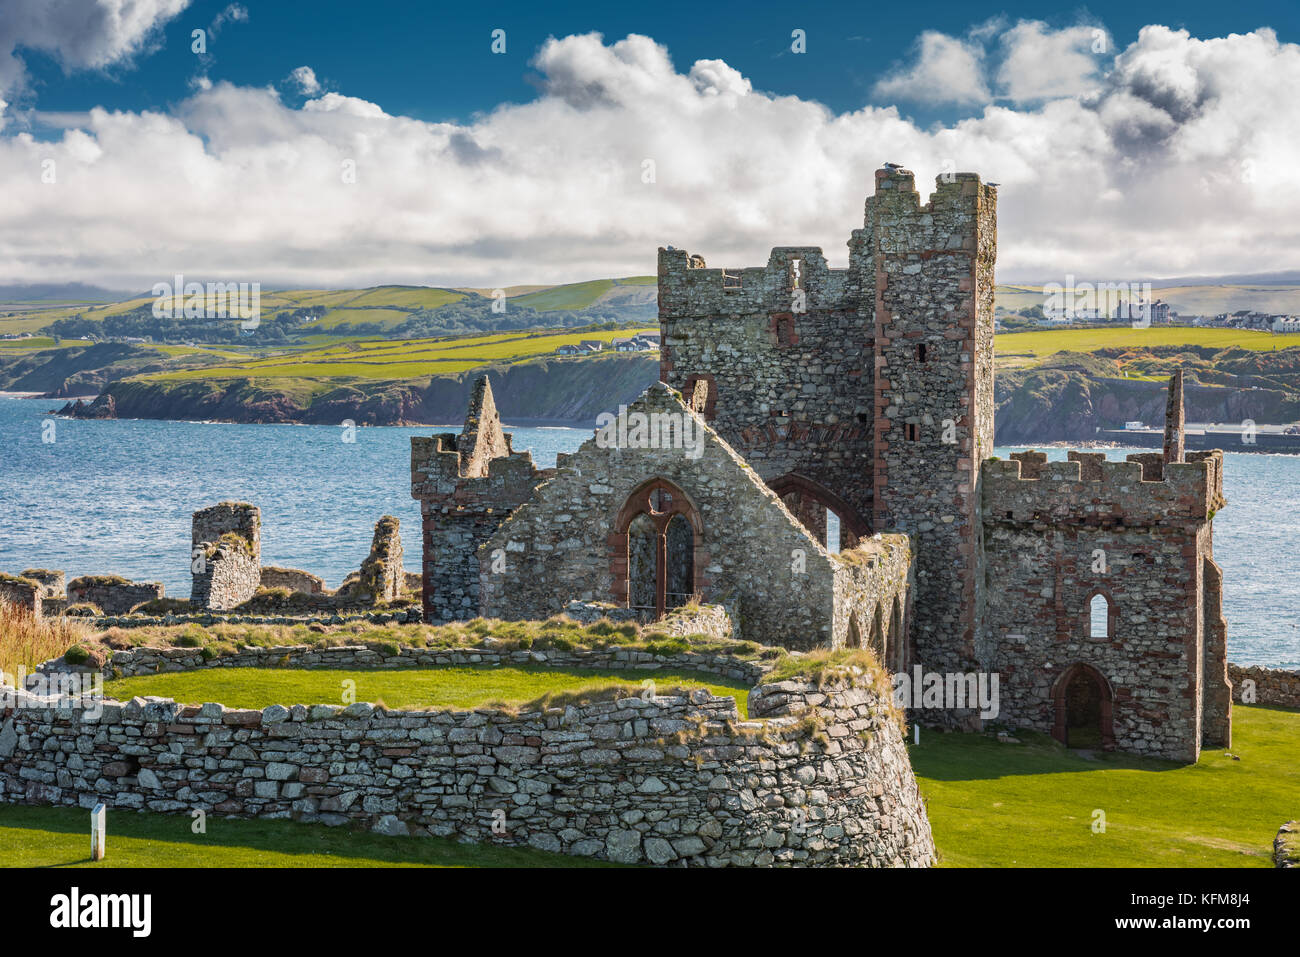 Peel Castle, halbmondförmigen Batterie und St Deutsche, der Kathedrale St. Patrick's Isle, Insel Man. Stockbild